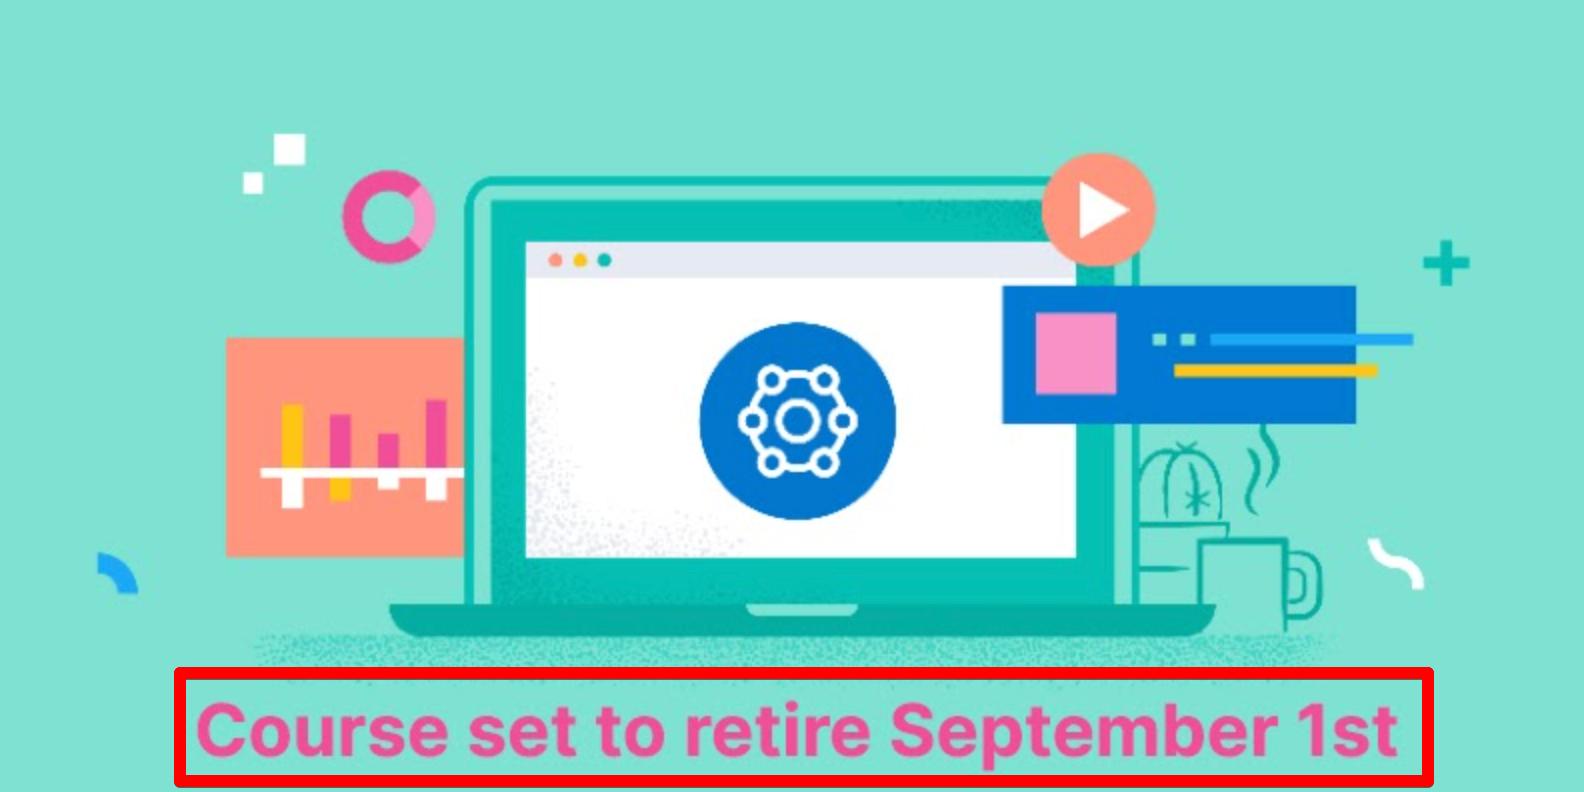 Retire_Courses_-_Education_[Internal]_-_Google_Drive_2021-06-01_15-38-11.png